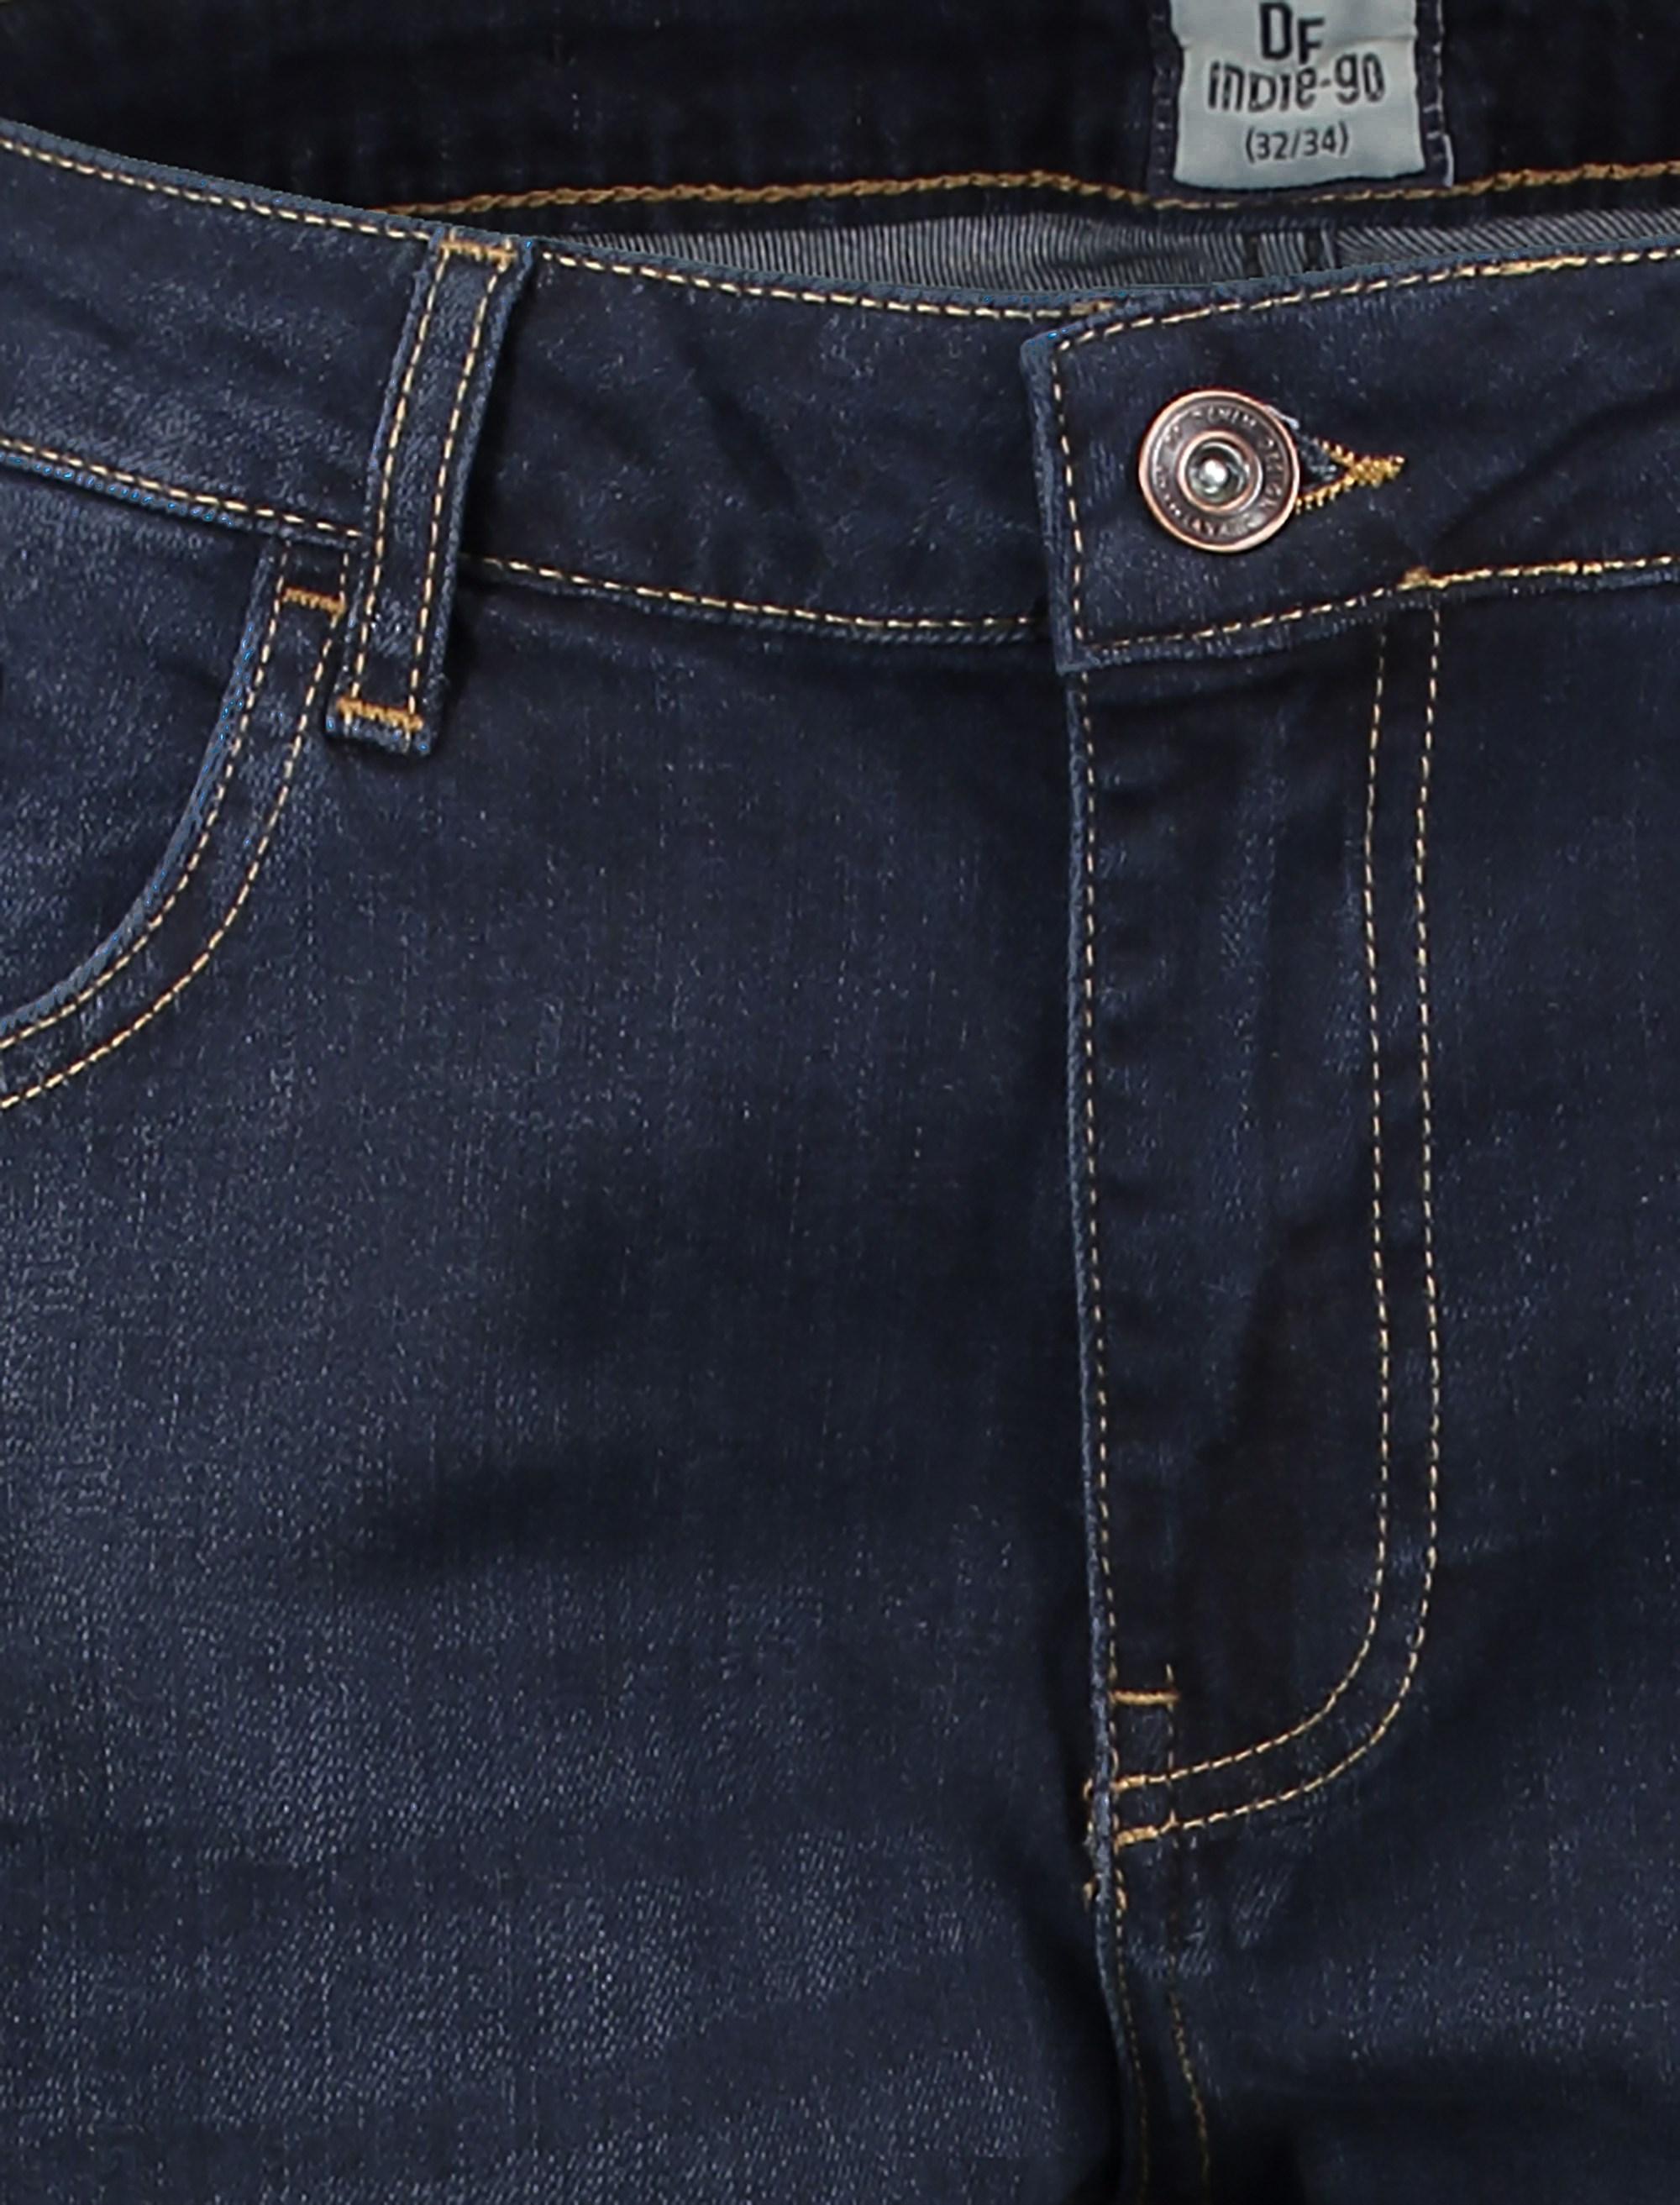 شلوار جین راسته مردانه - سرمه اي - 4